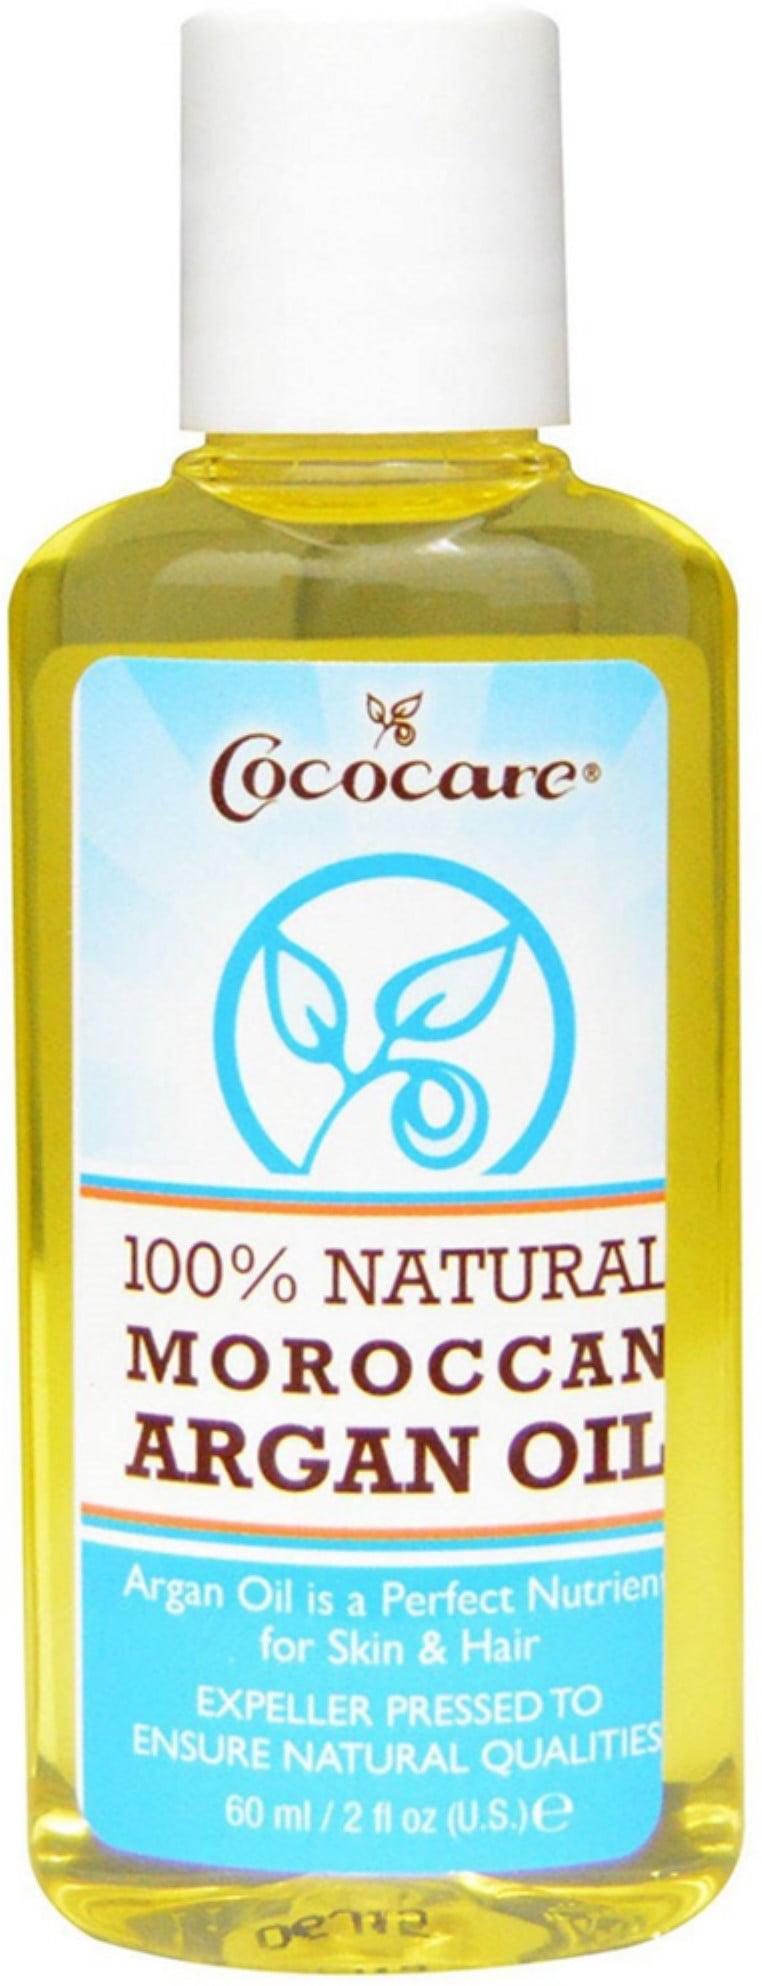 Cococare 100% Argan Oil 2 oz. (Pack of 6) A Glowing Regimen Trial Set